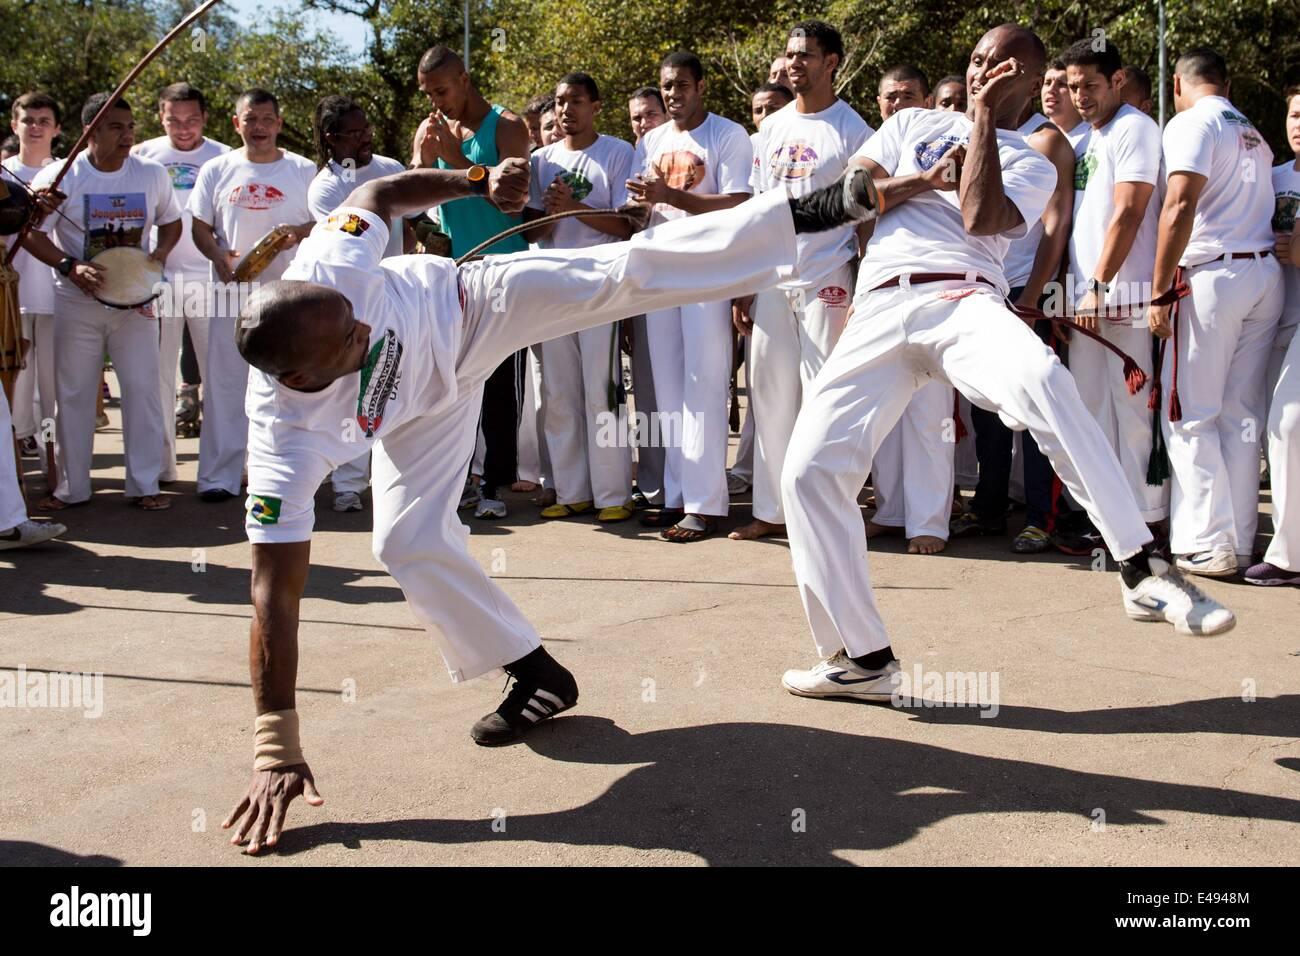 Sao Paulo, Brazil. 06th July, 2014. Brazilian street dancers perform Capoeira at the Ibirapuera Park in Sao Paulo, Stock Photo